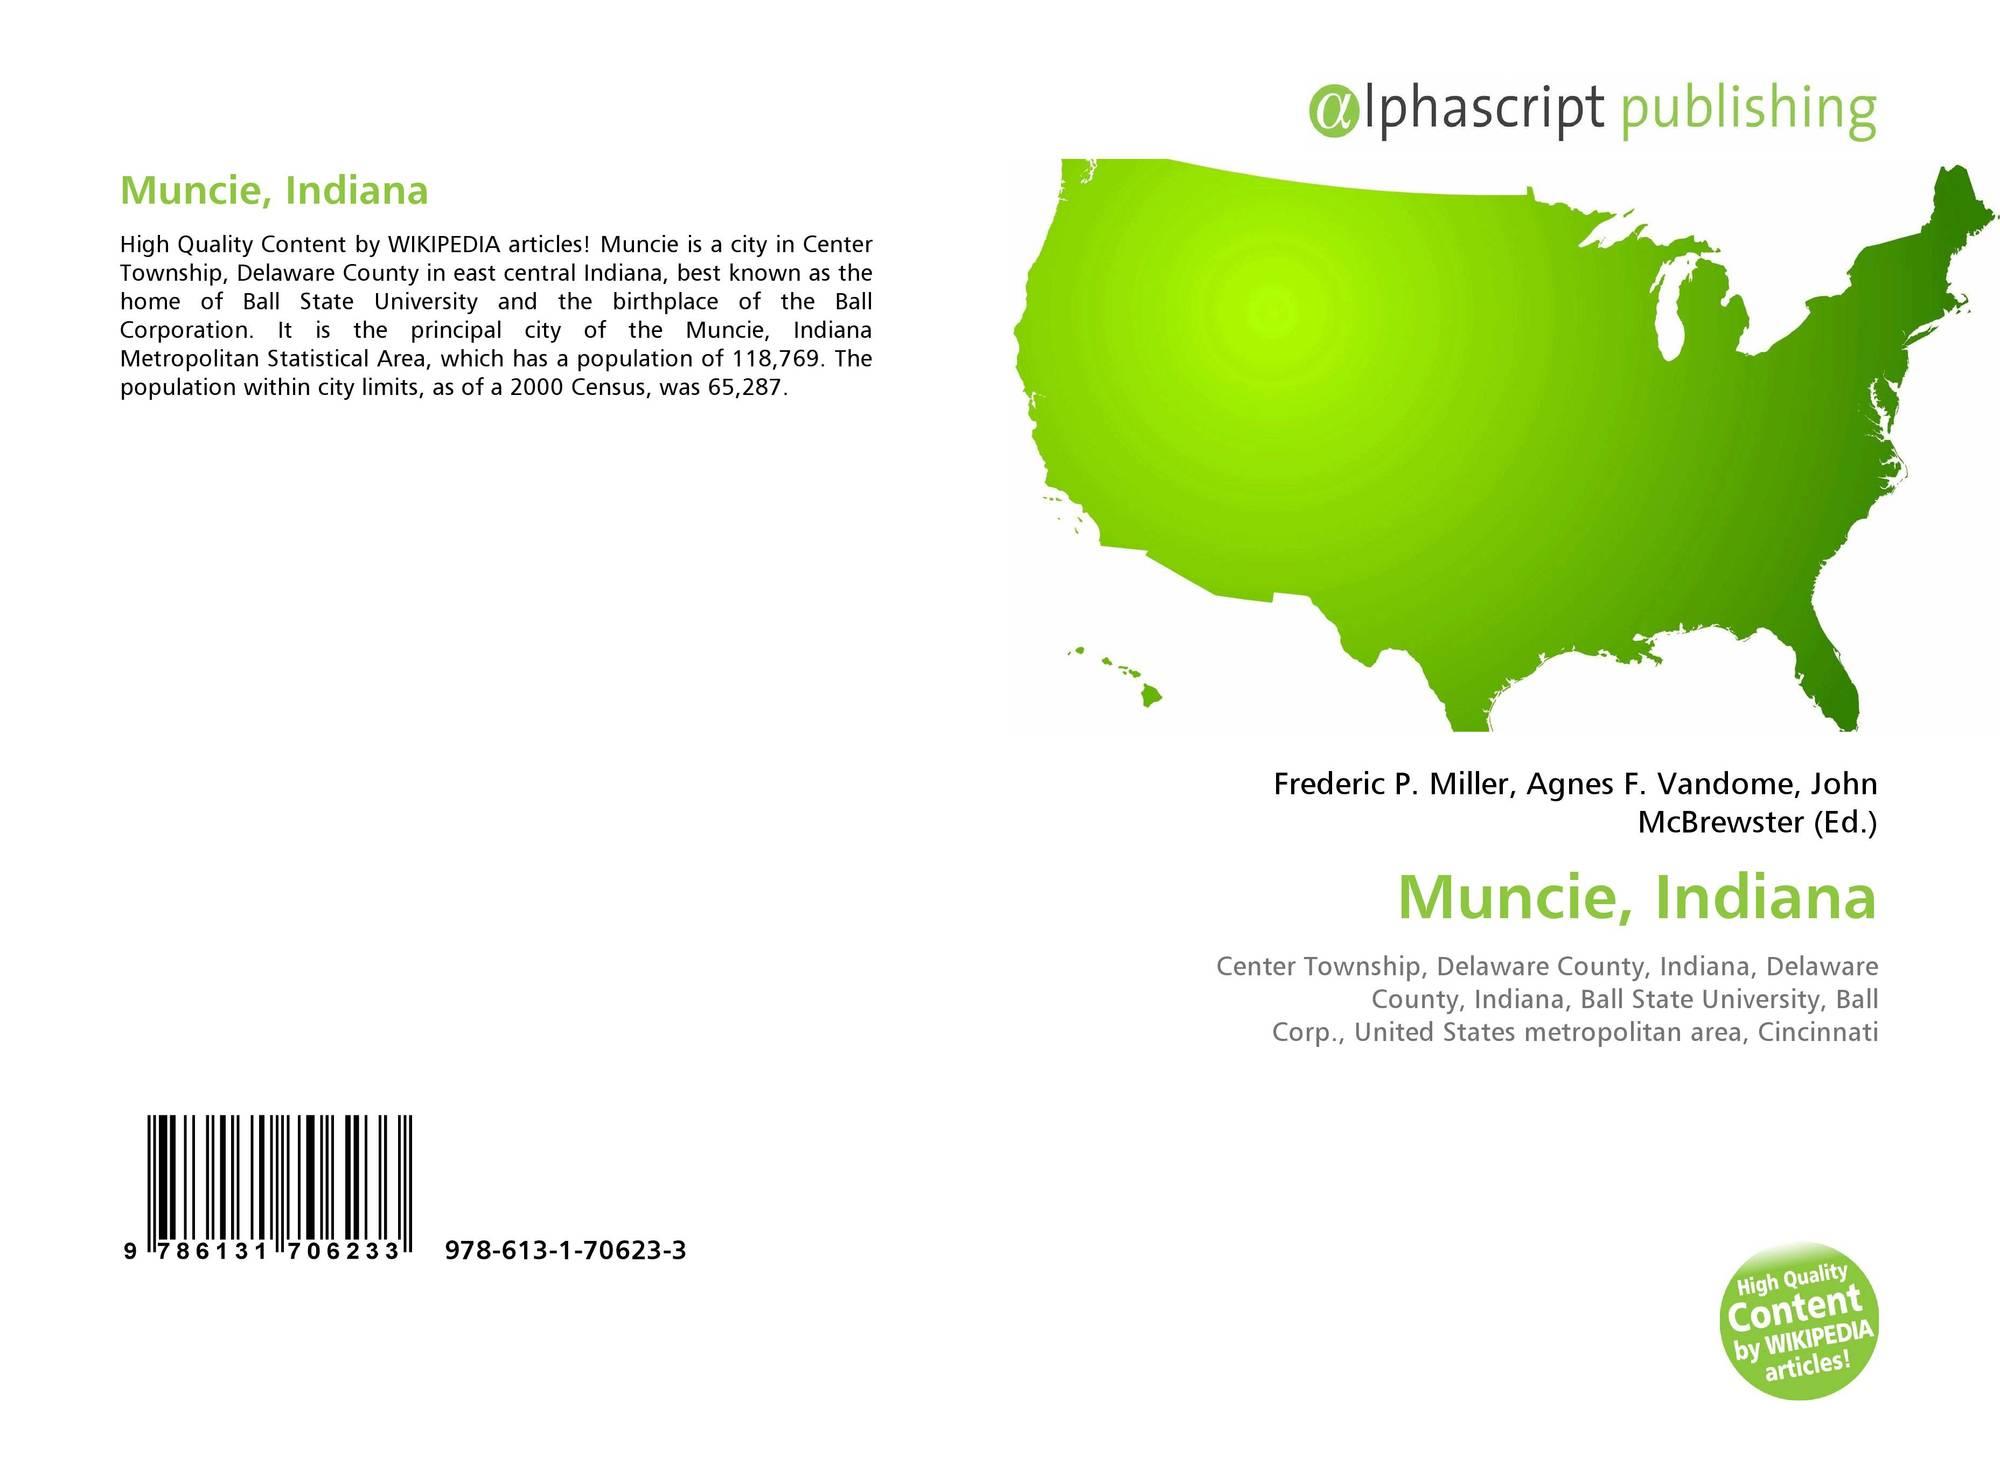 Illinois vermilion county muncie - Bookcover Of Muncie Indiana Omni Badge 9307e2201e5f762643a64561af3456be64a87707602f96b92ef18a9bbcada116